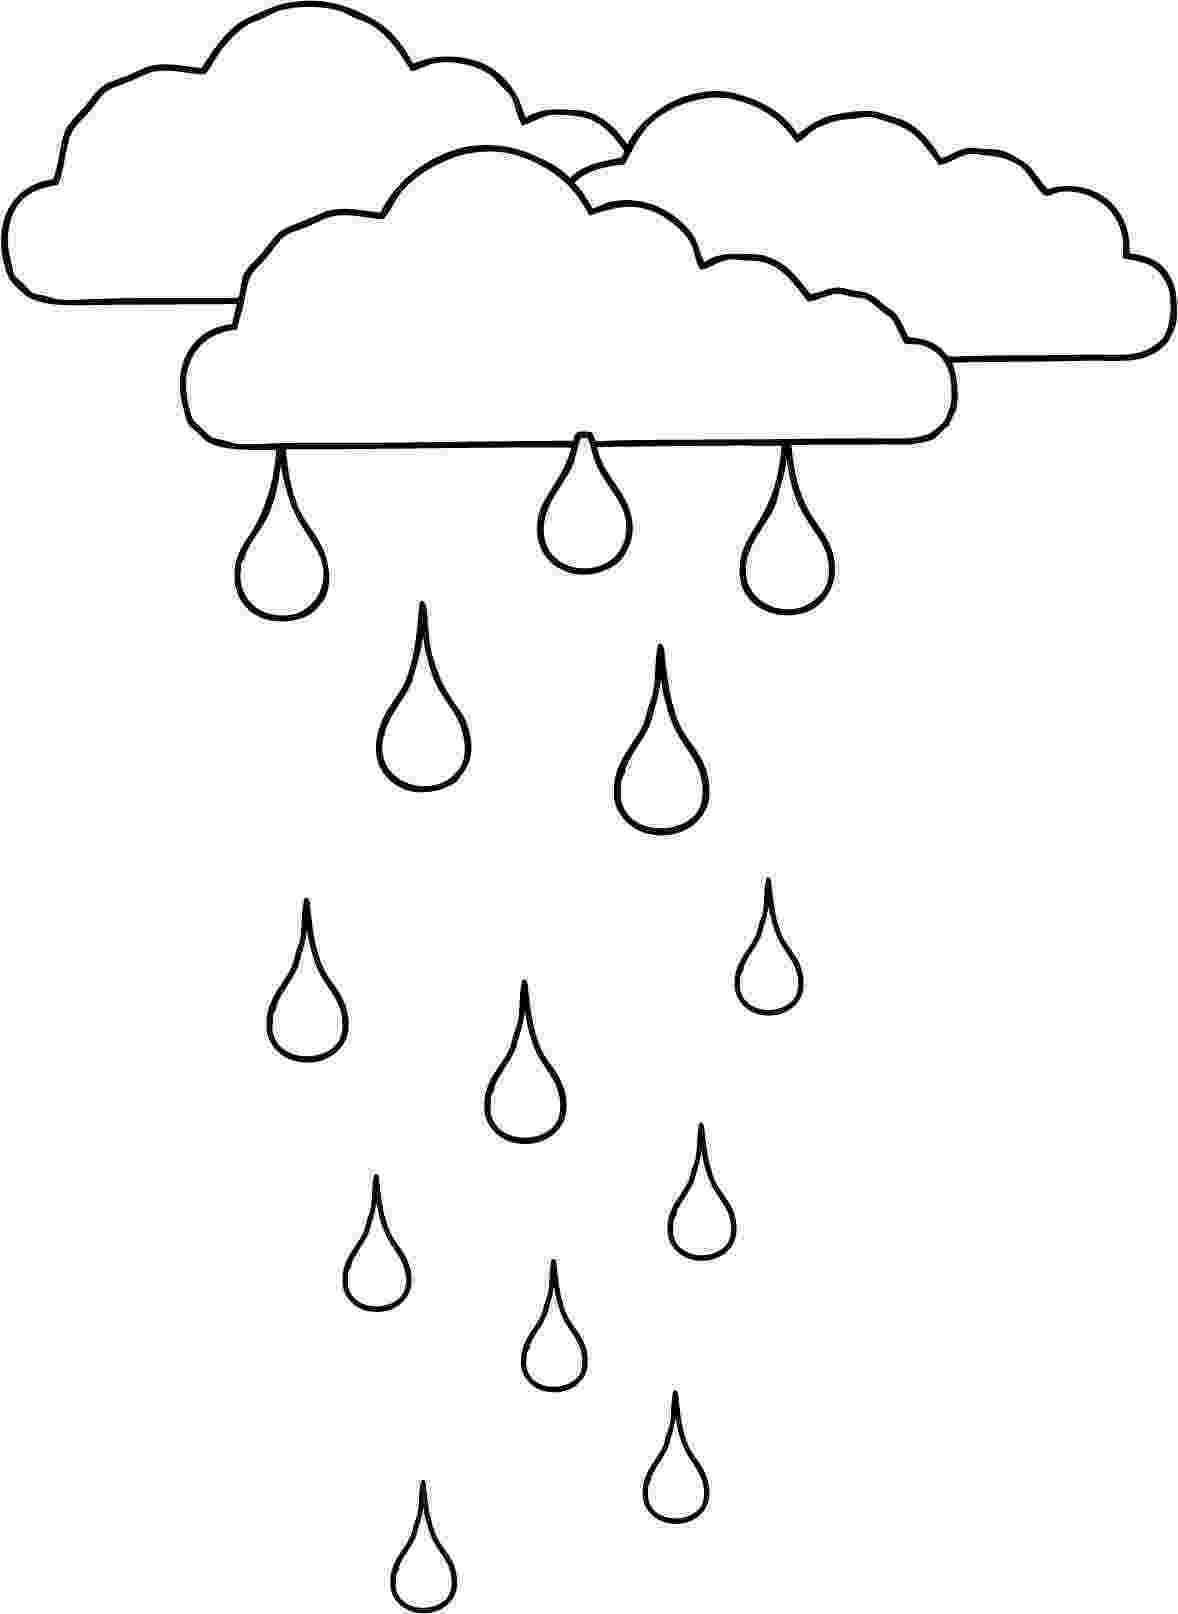 raindrop coloring page raindrop page coloring pages raindrop page coloring